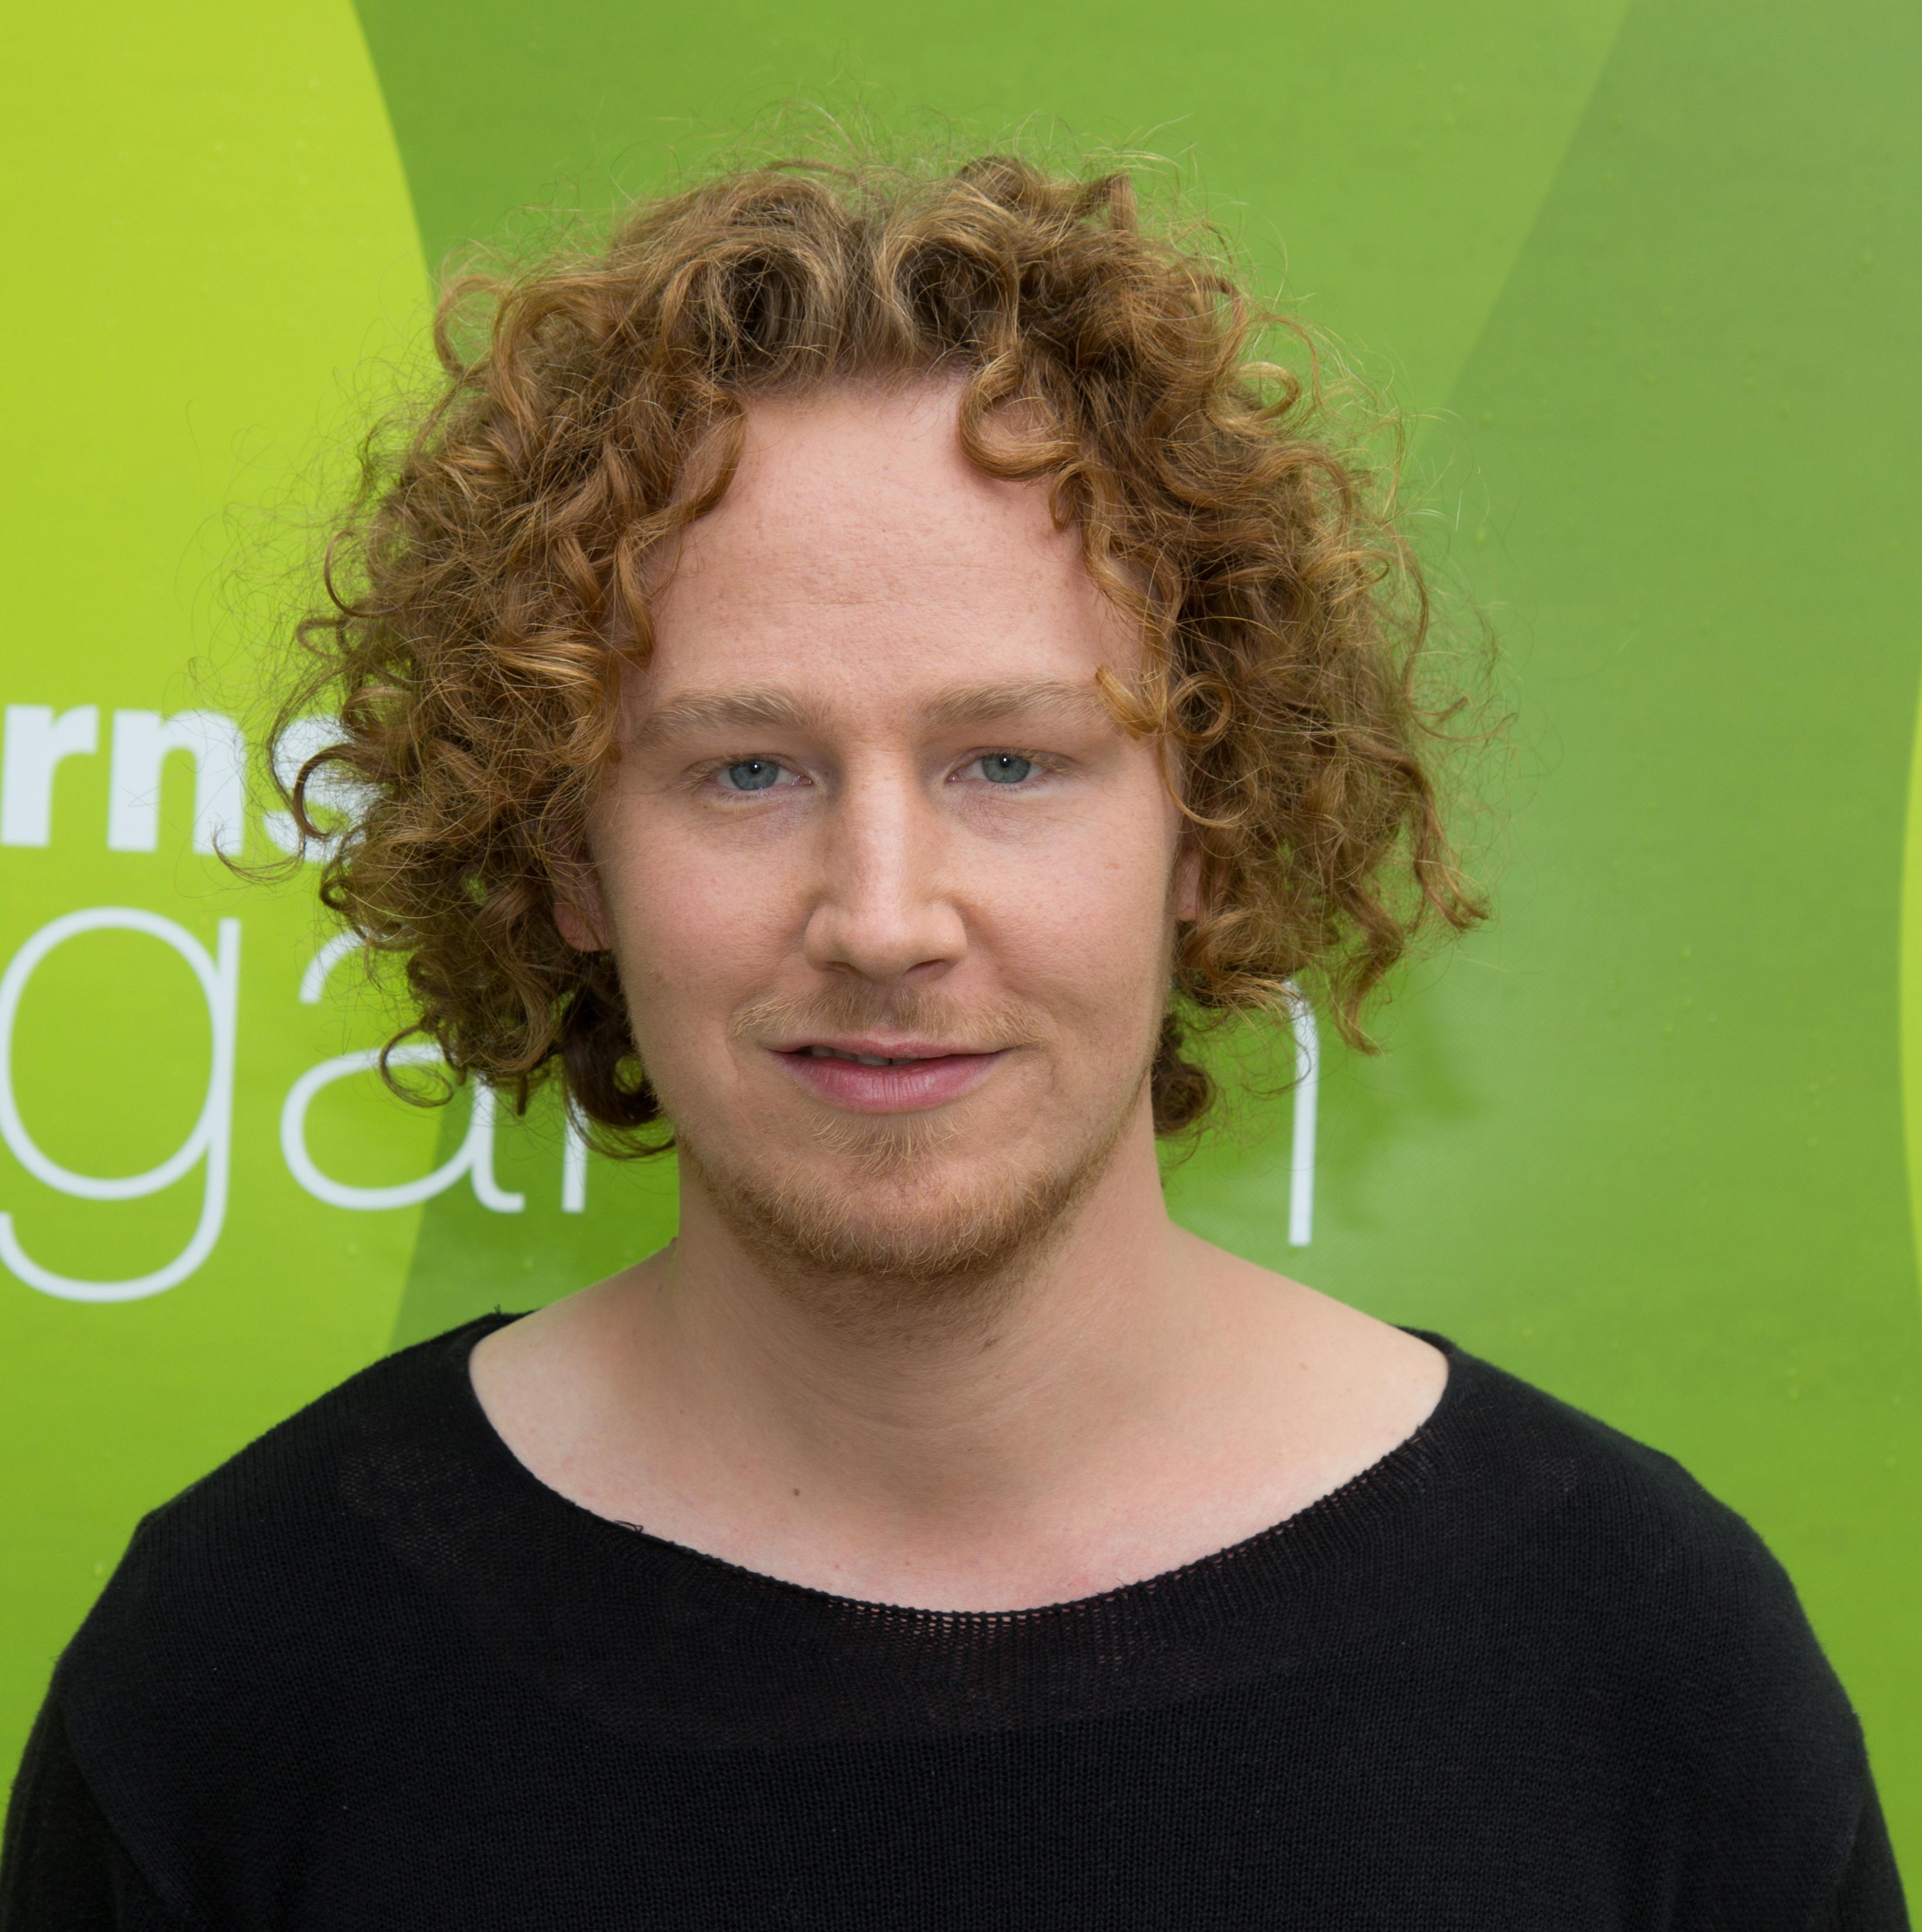 Michael Schulte Sänger Wikipedia